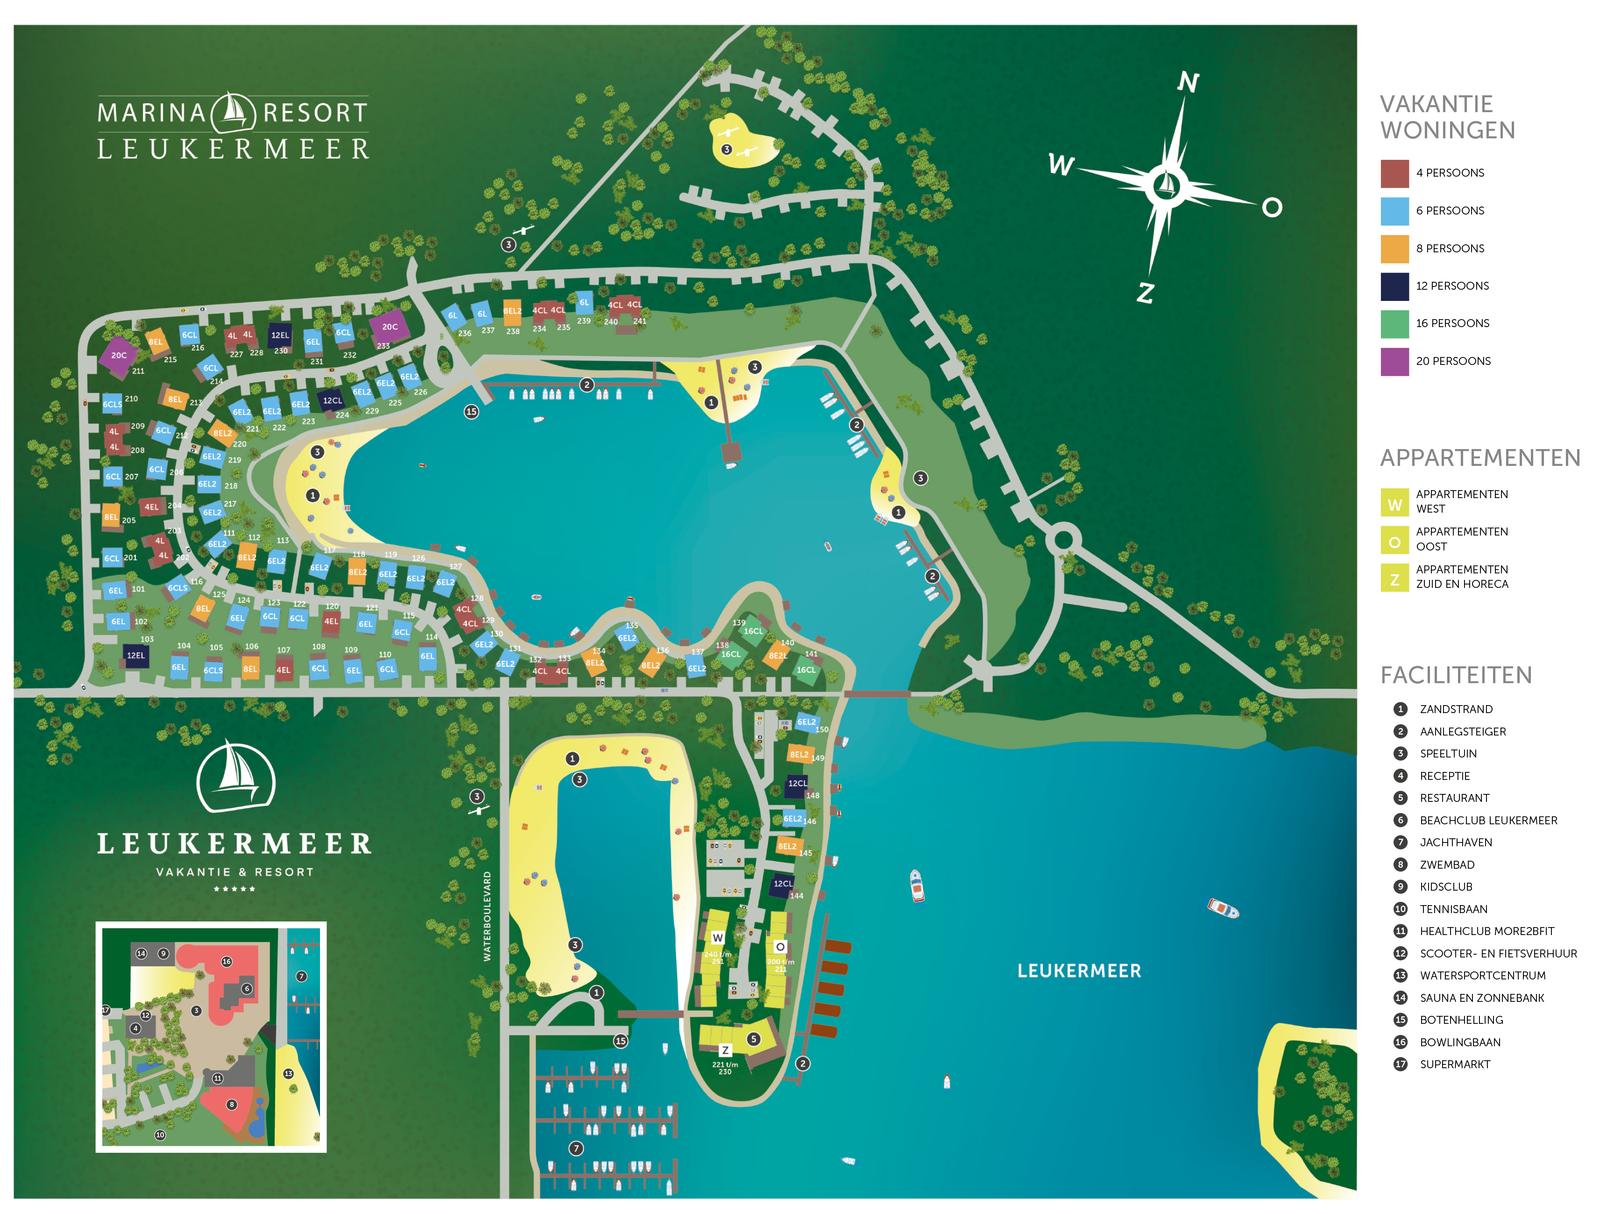 Map Marina Resort Leukermeer